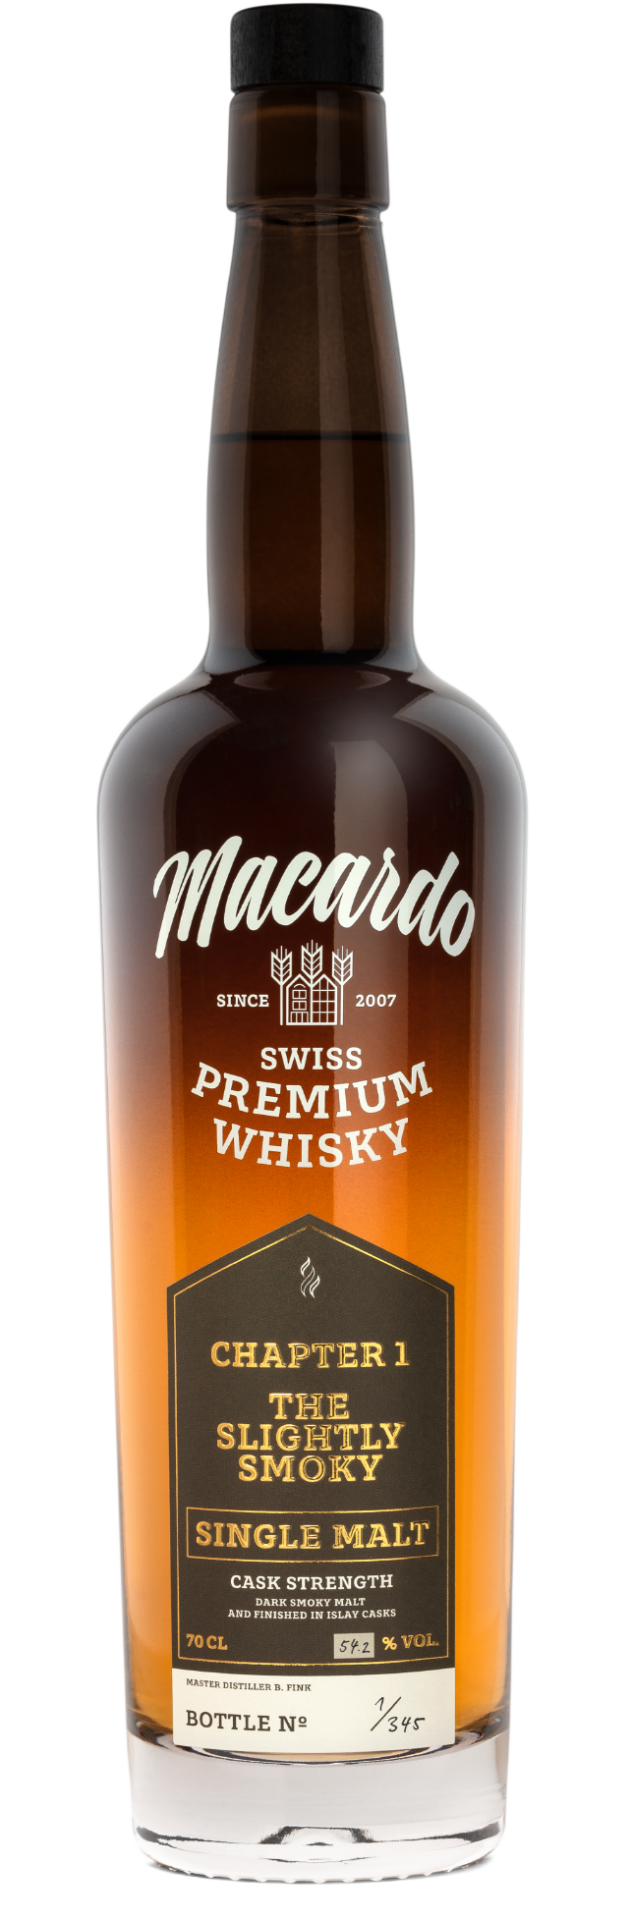 Chapter I - the slightly Smoky one - Macardo Destillerie